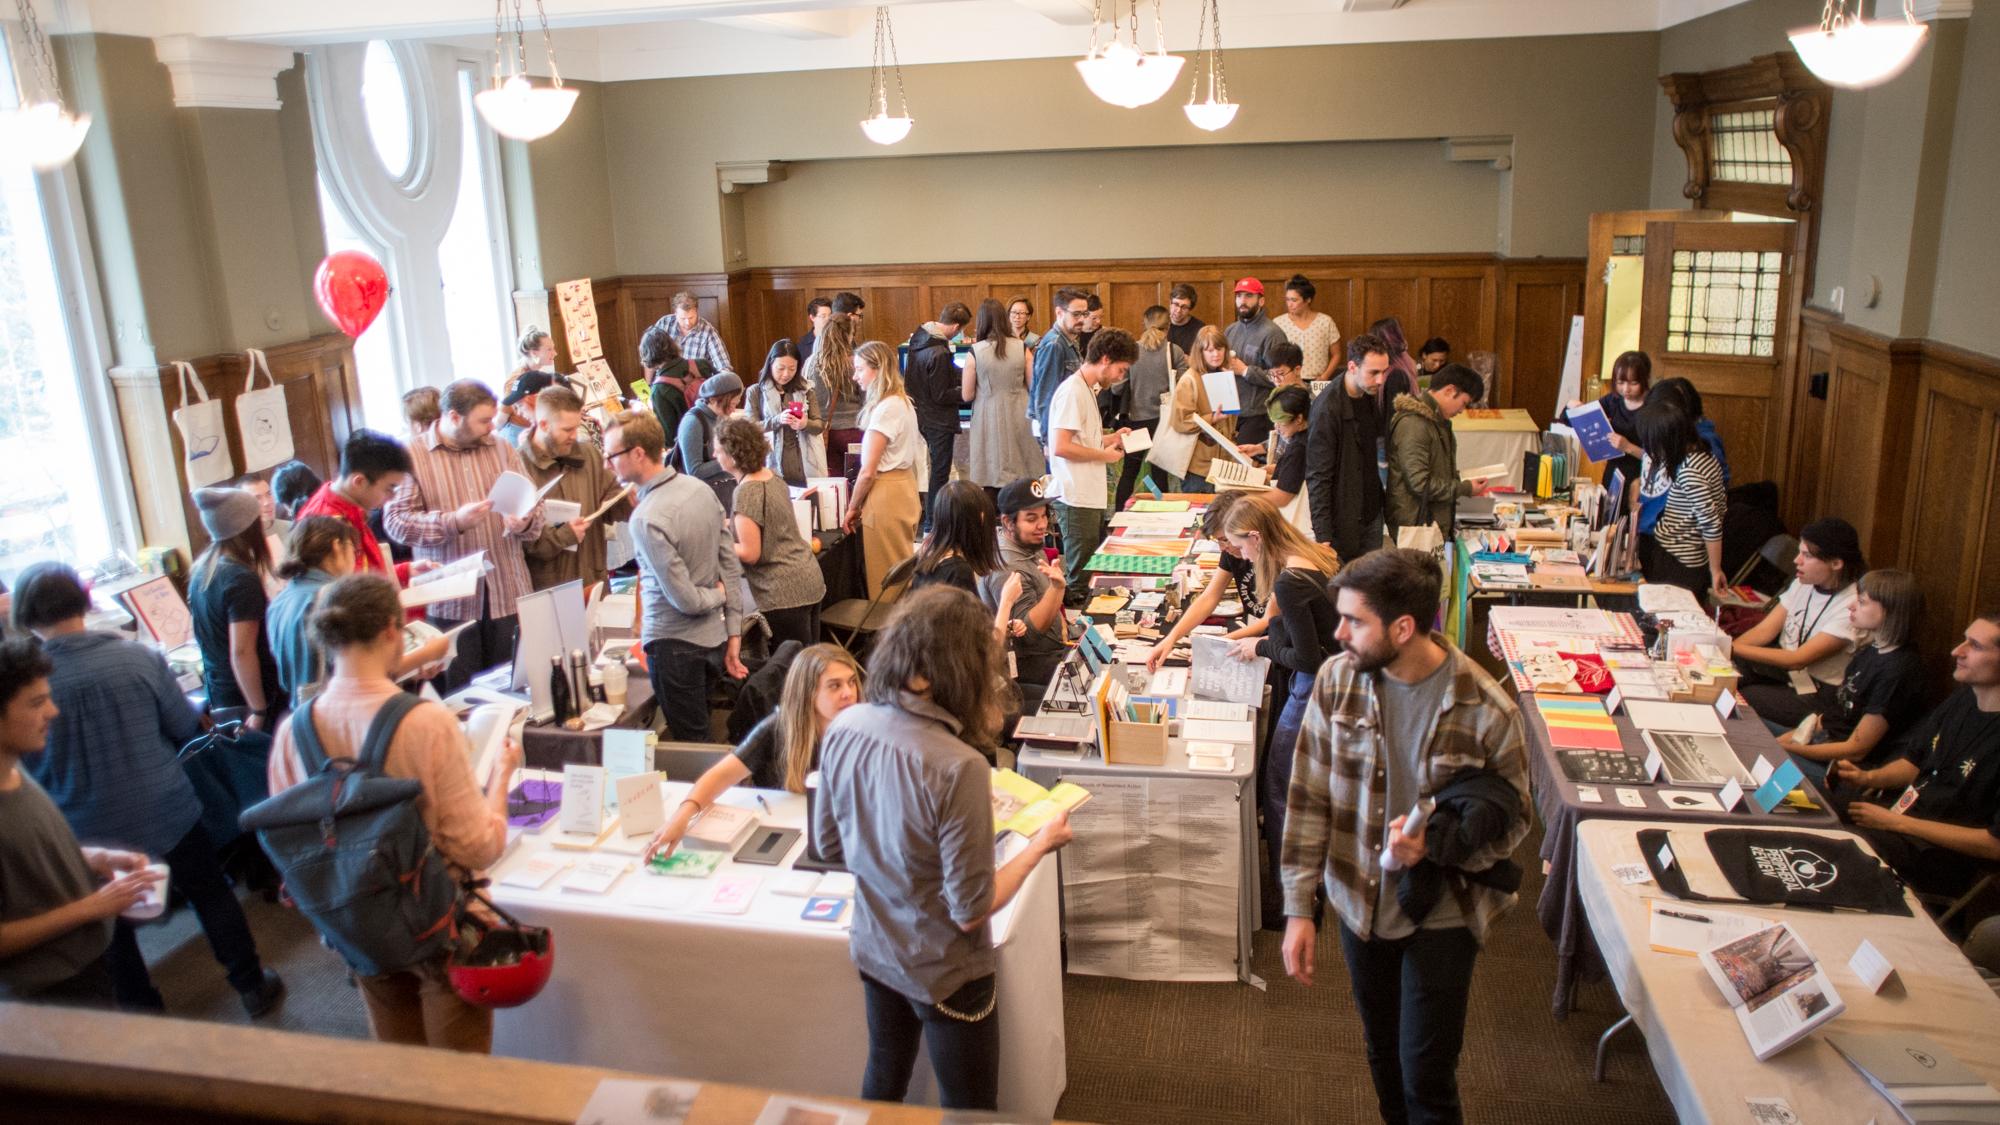 Vancouver Art Book Fair 2017. Photo by Bryce Hunnersen